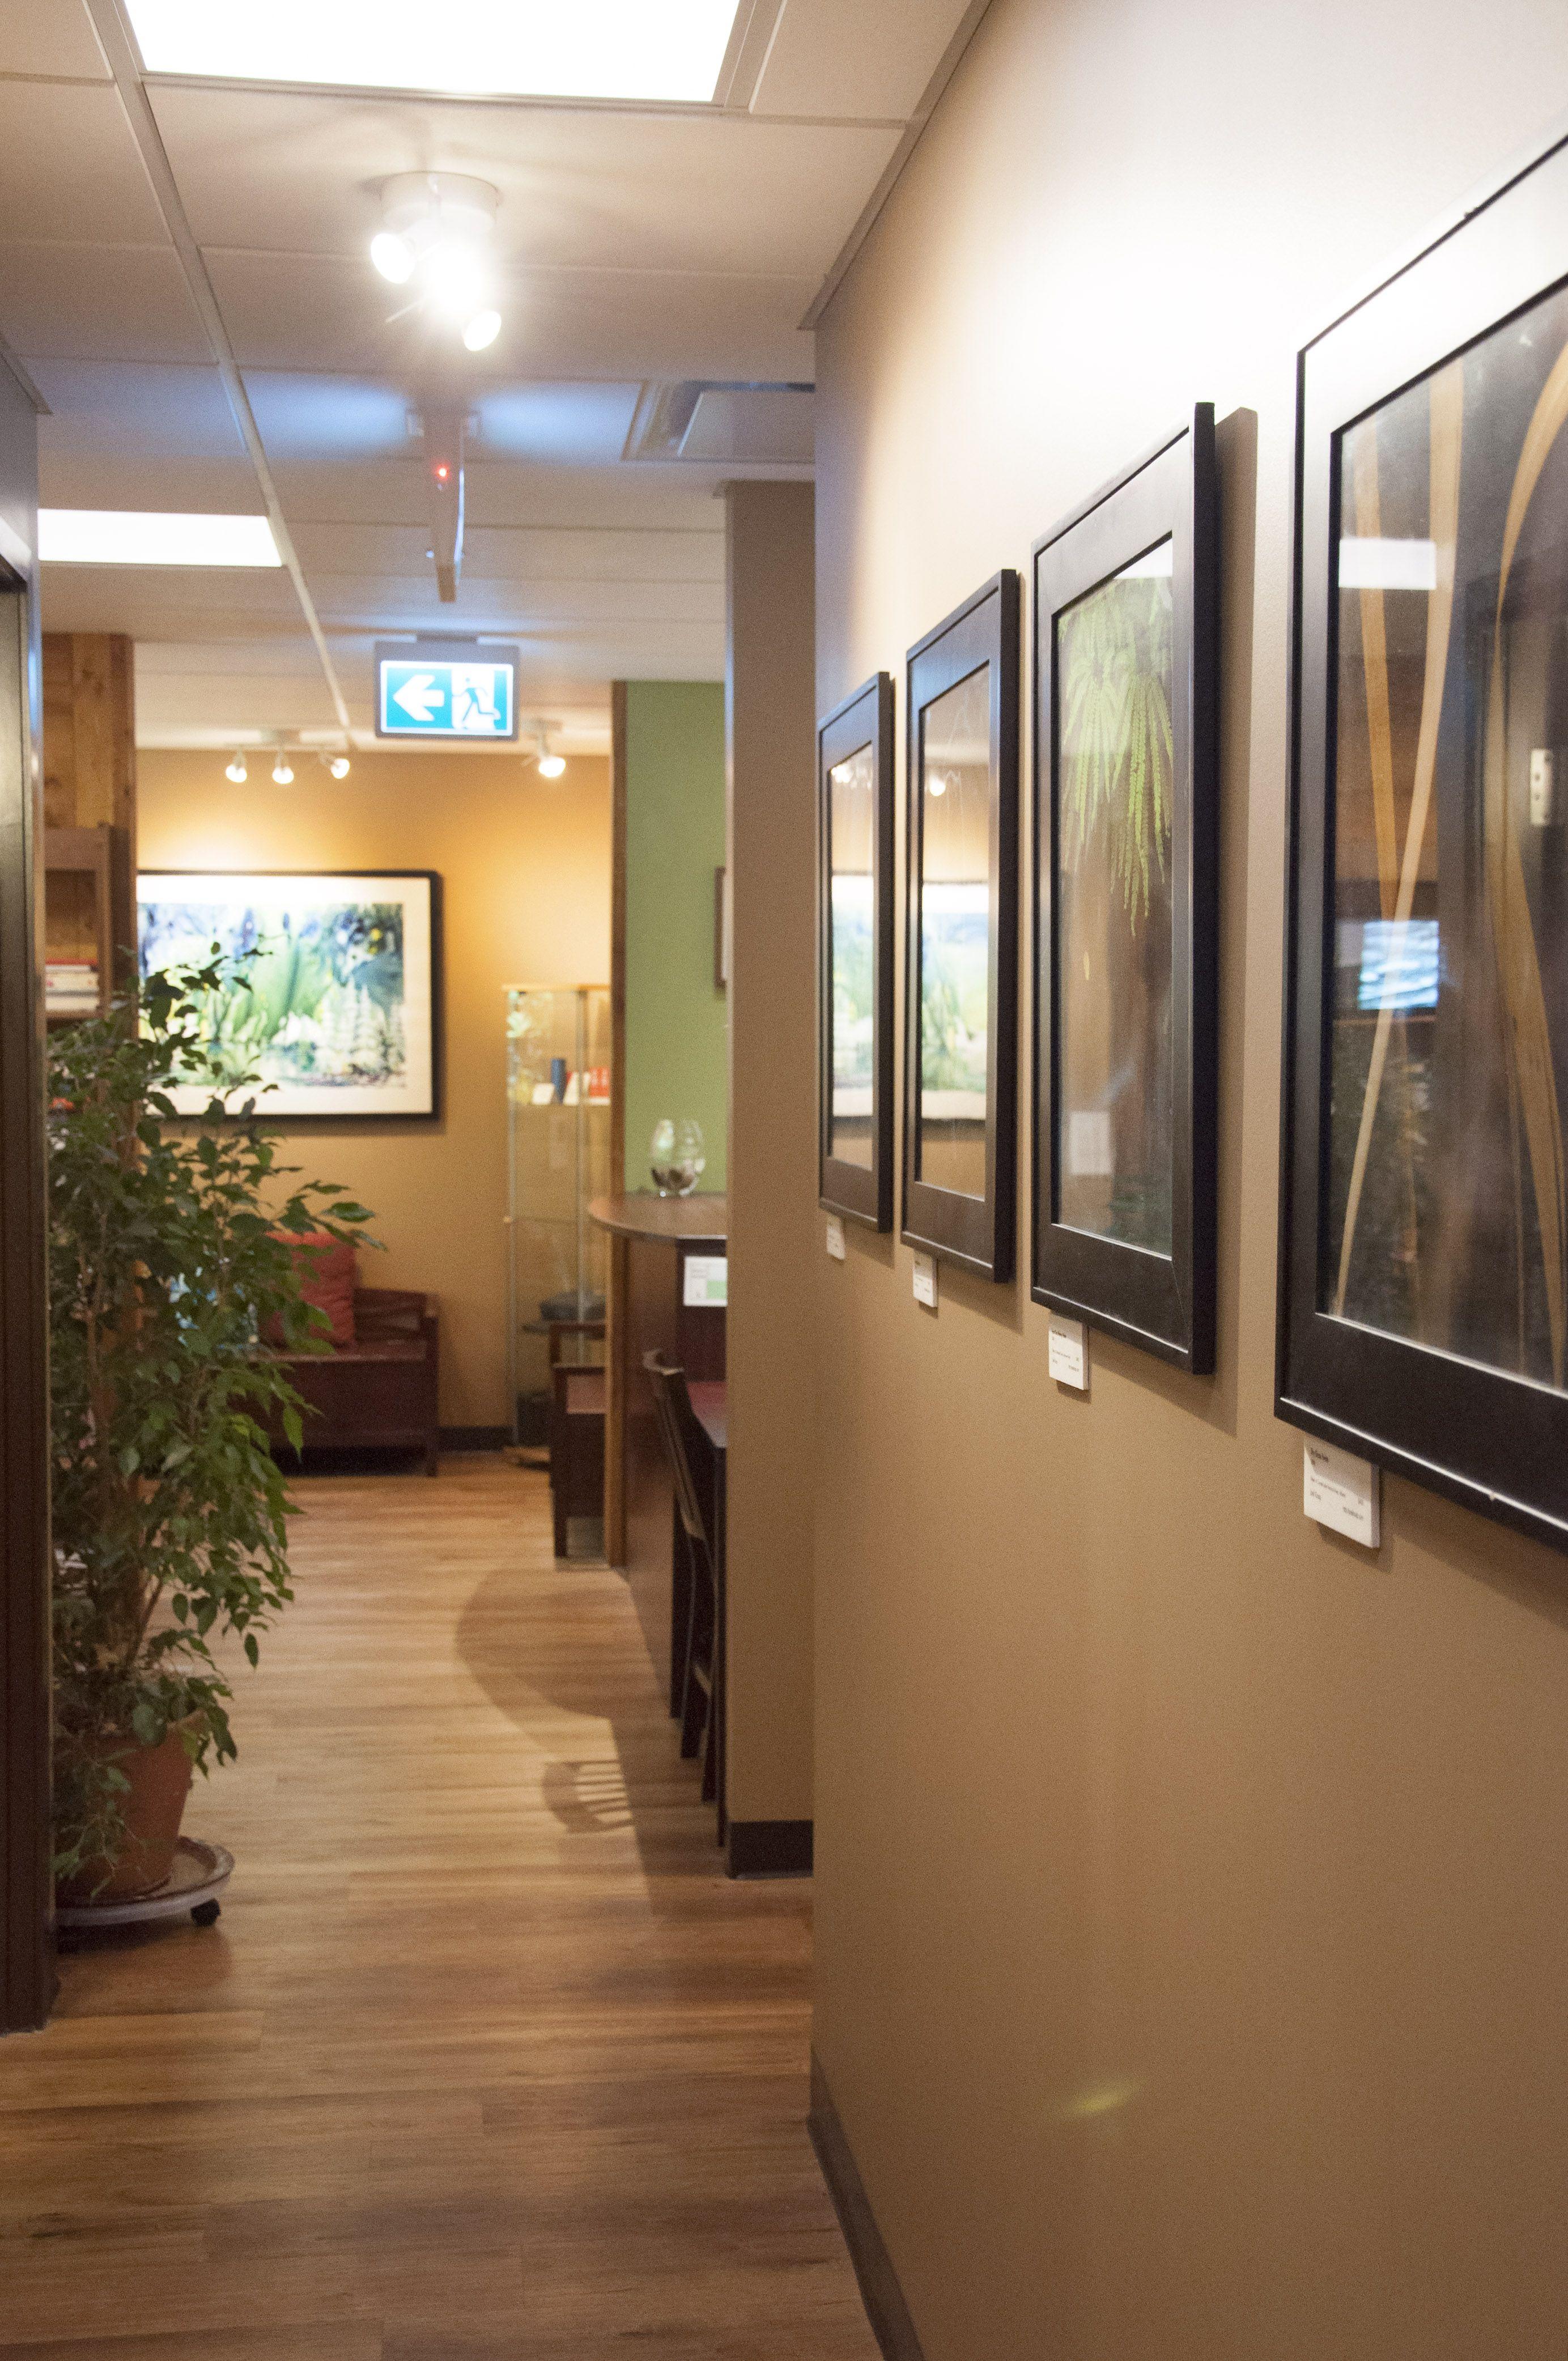 Acupuncture And Massage Clinic Design In 2020 Clinic Design Design